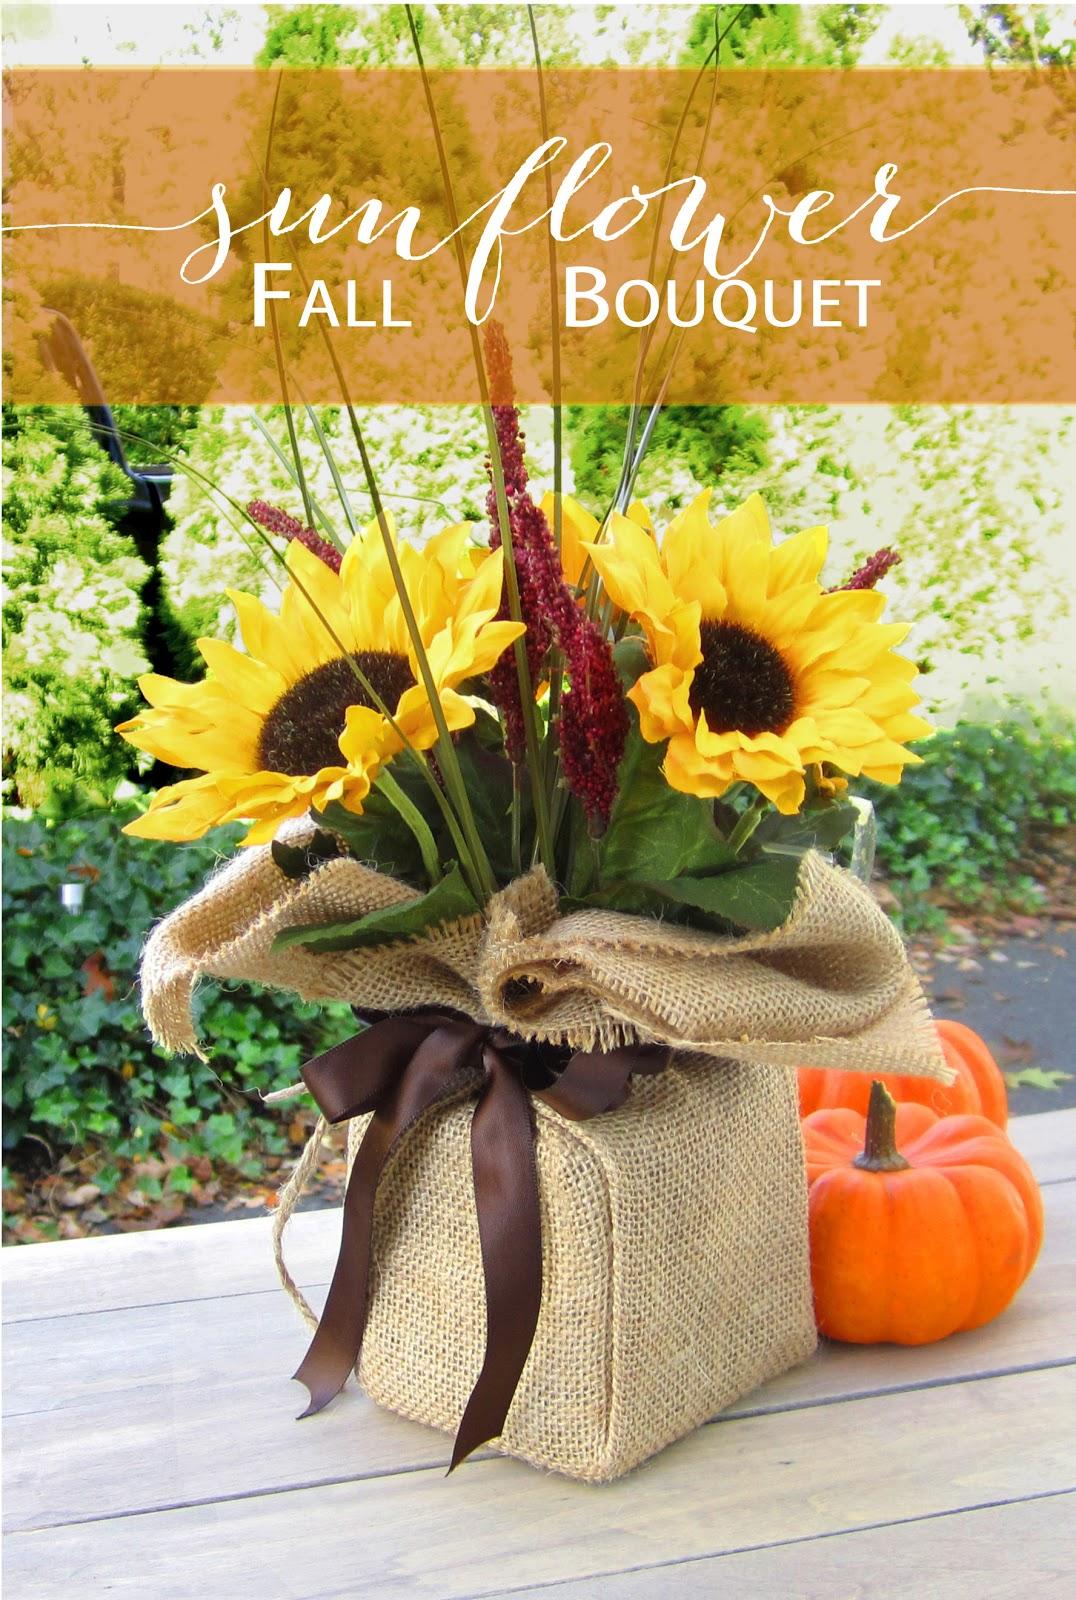 DIY sunflower bouquet from dollar store supplies